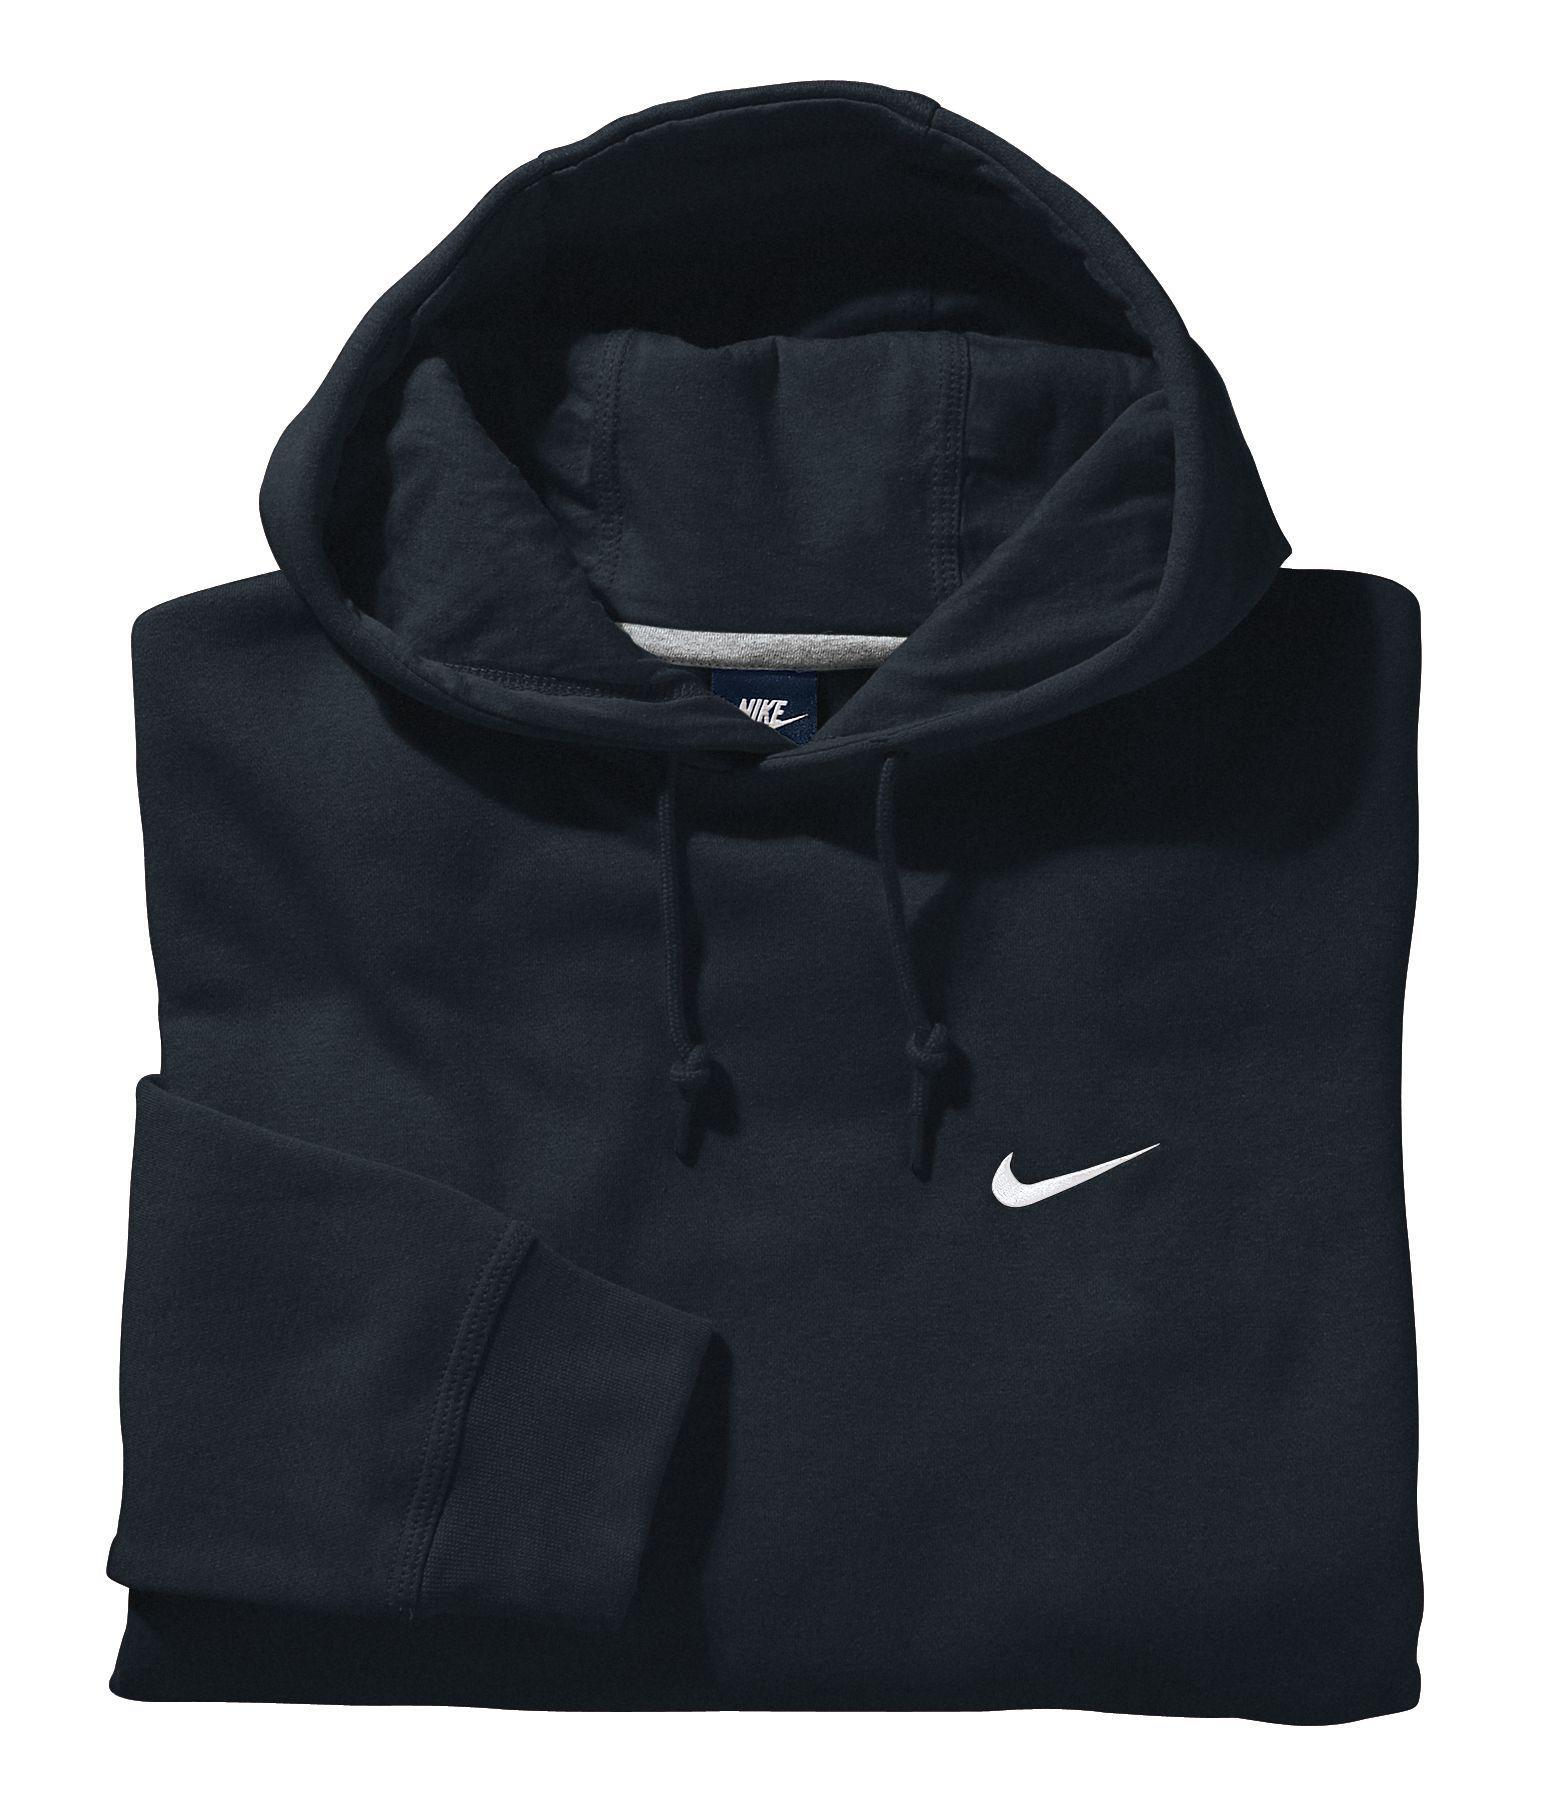 b7771a5aa7df Lyst - Nike Classic Club Fleece Hoodie in Black for Men